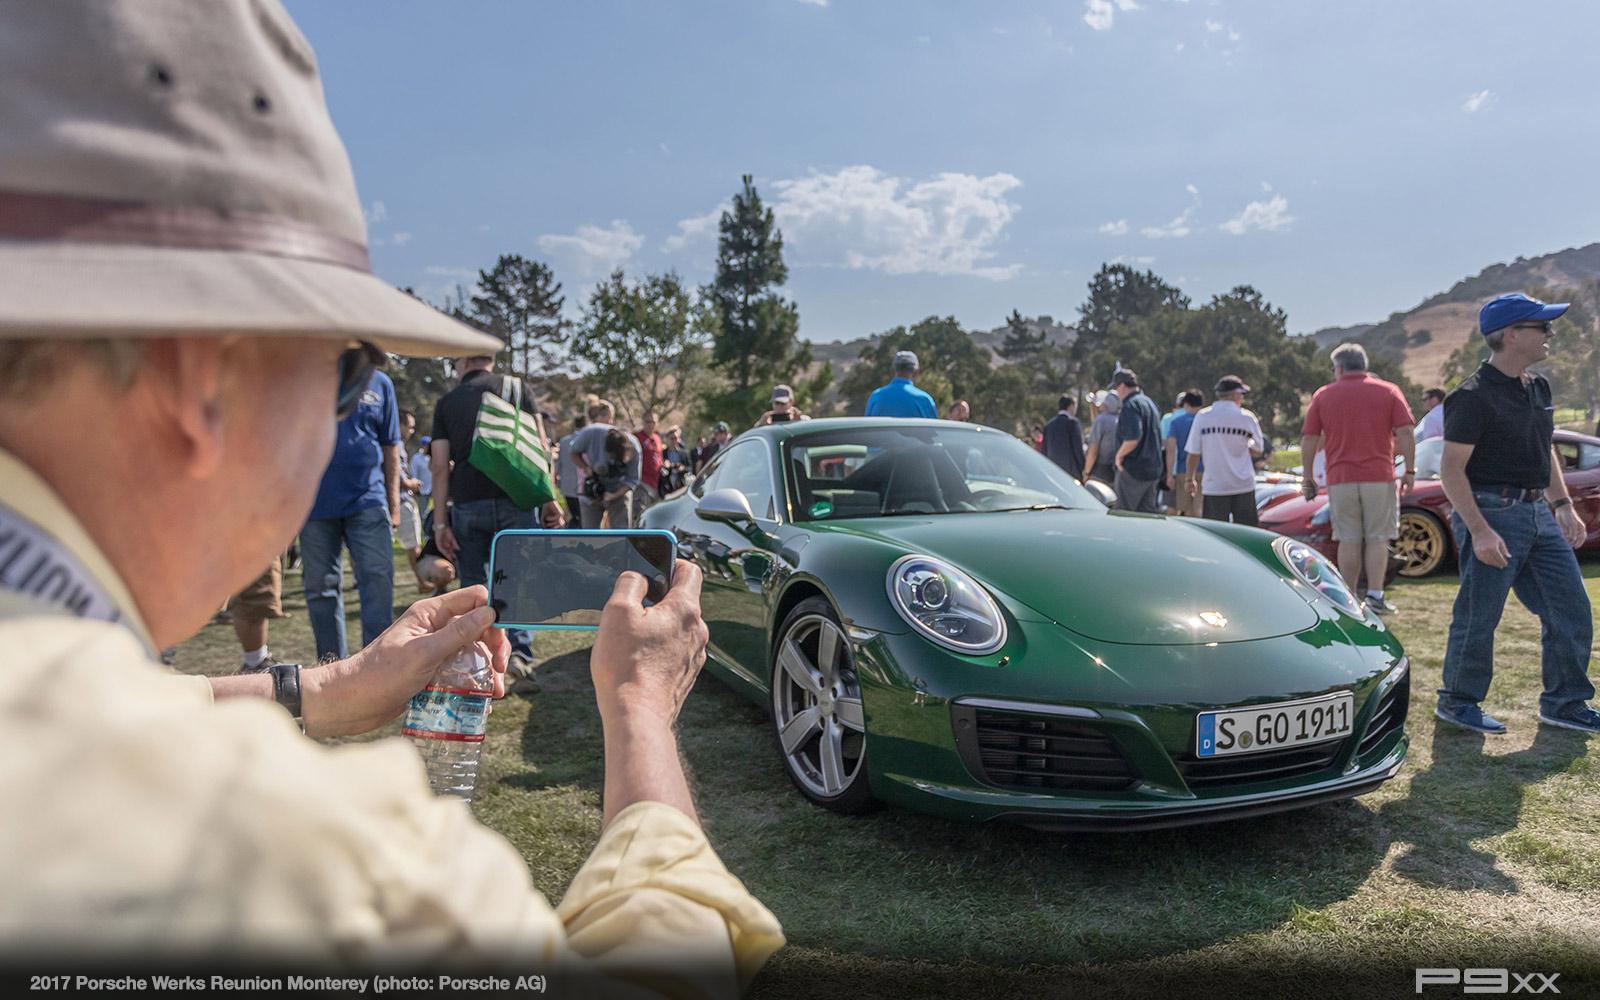 850362_one_millionth_911_monterey_historics_mazda_raceway_laguna_seca_monterey_2017_porsche_ag